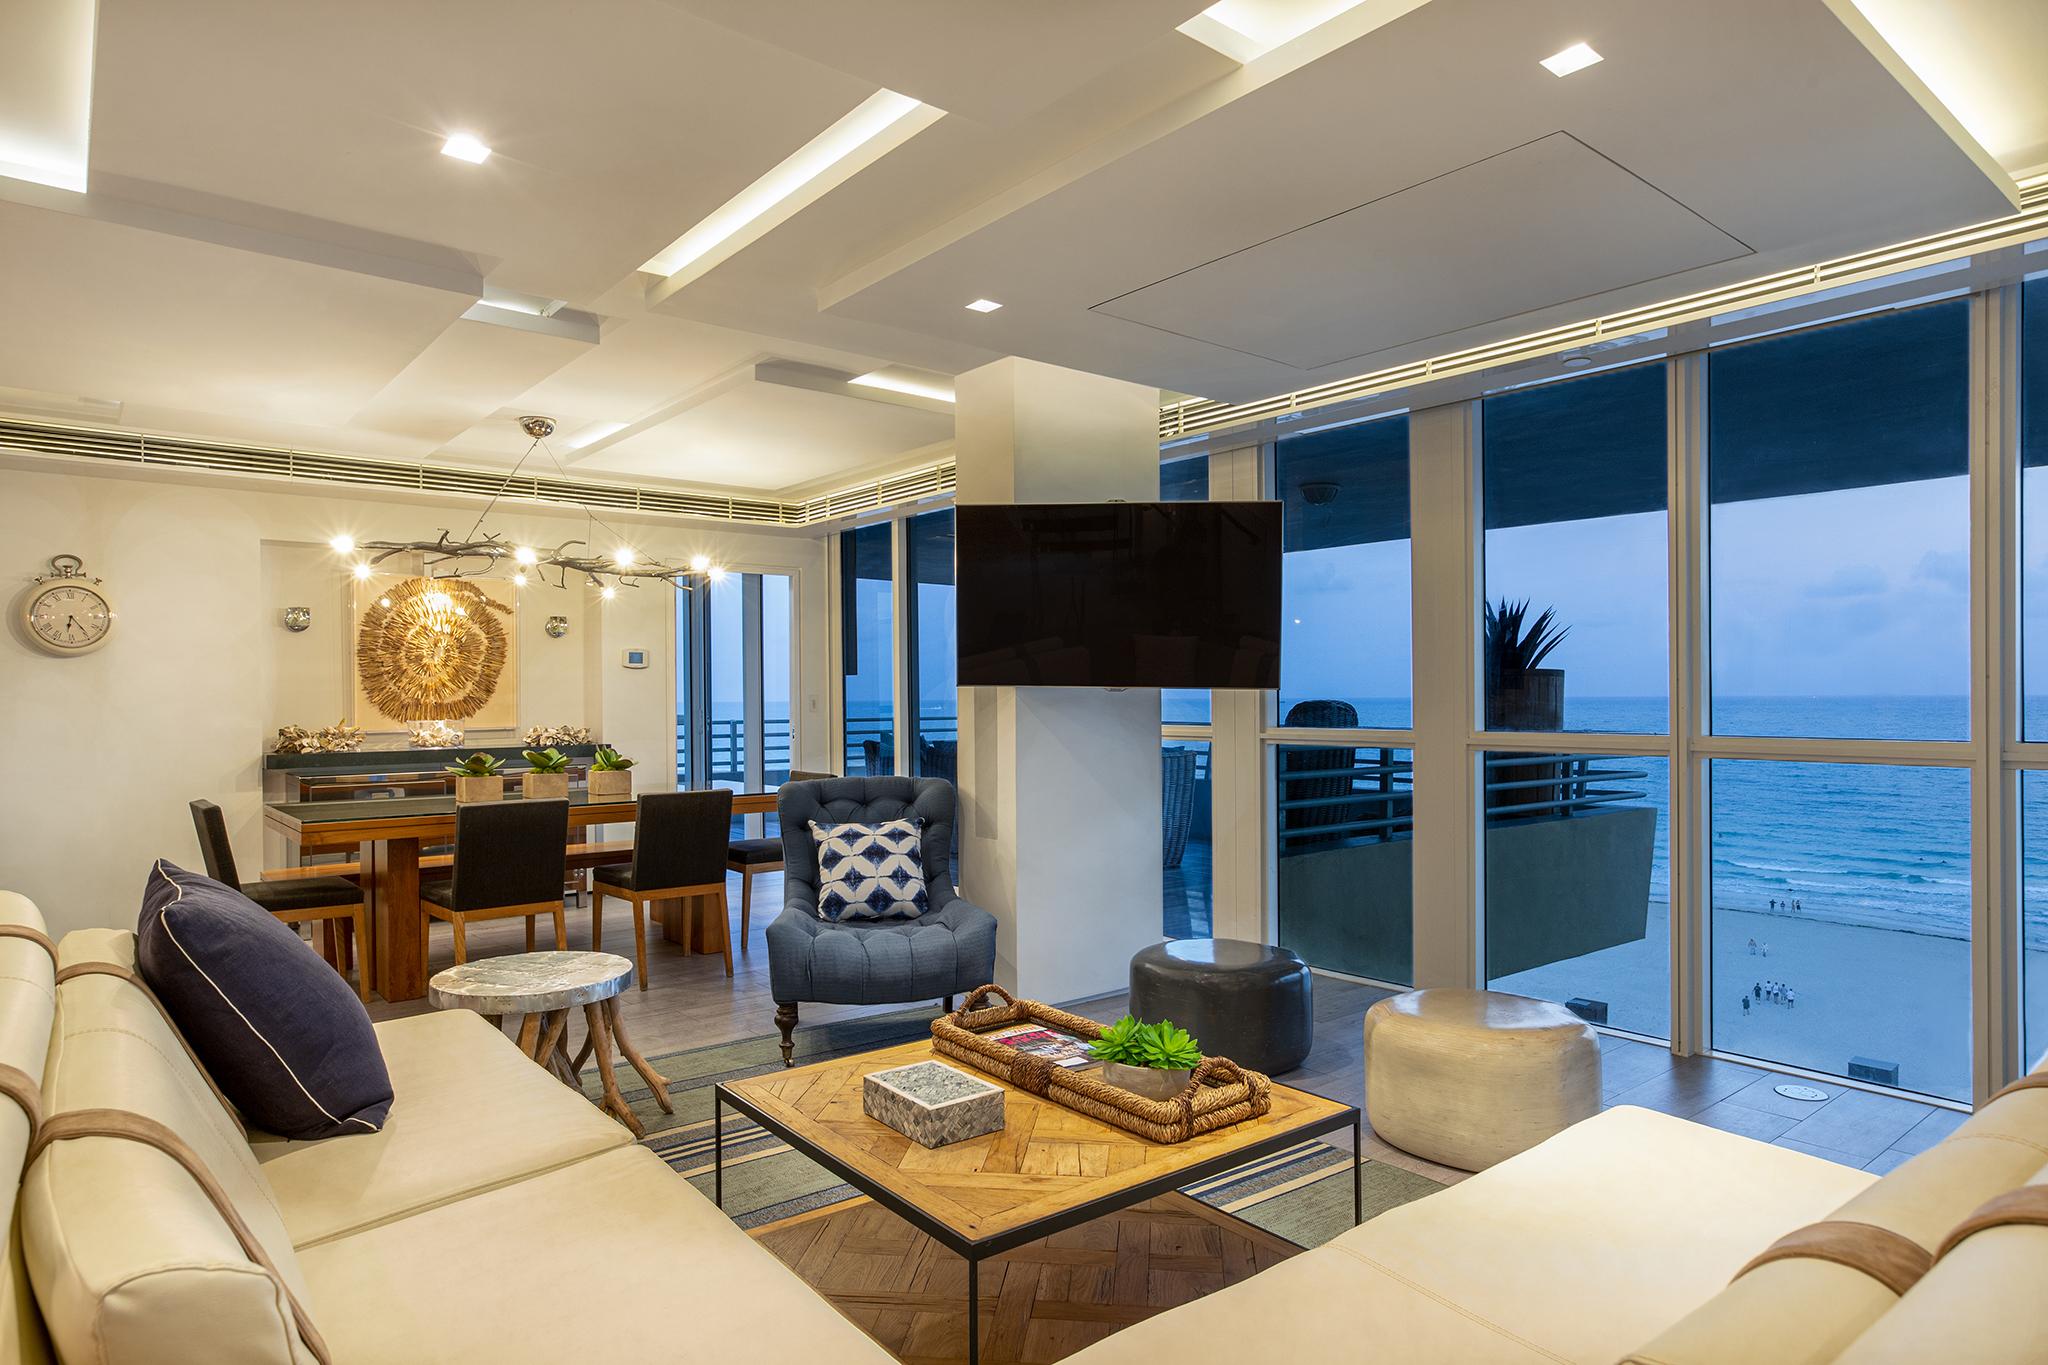 Hilton Bentley Miami South Beach Hotel Room 12